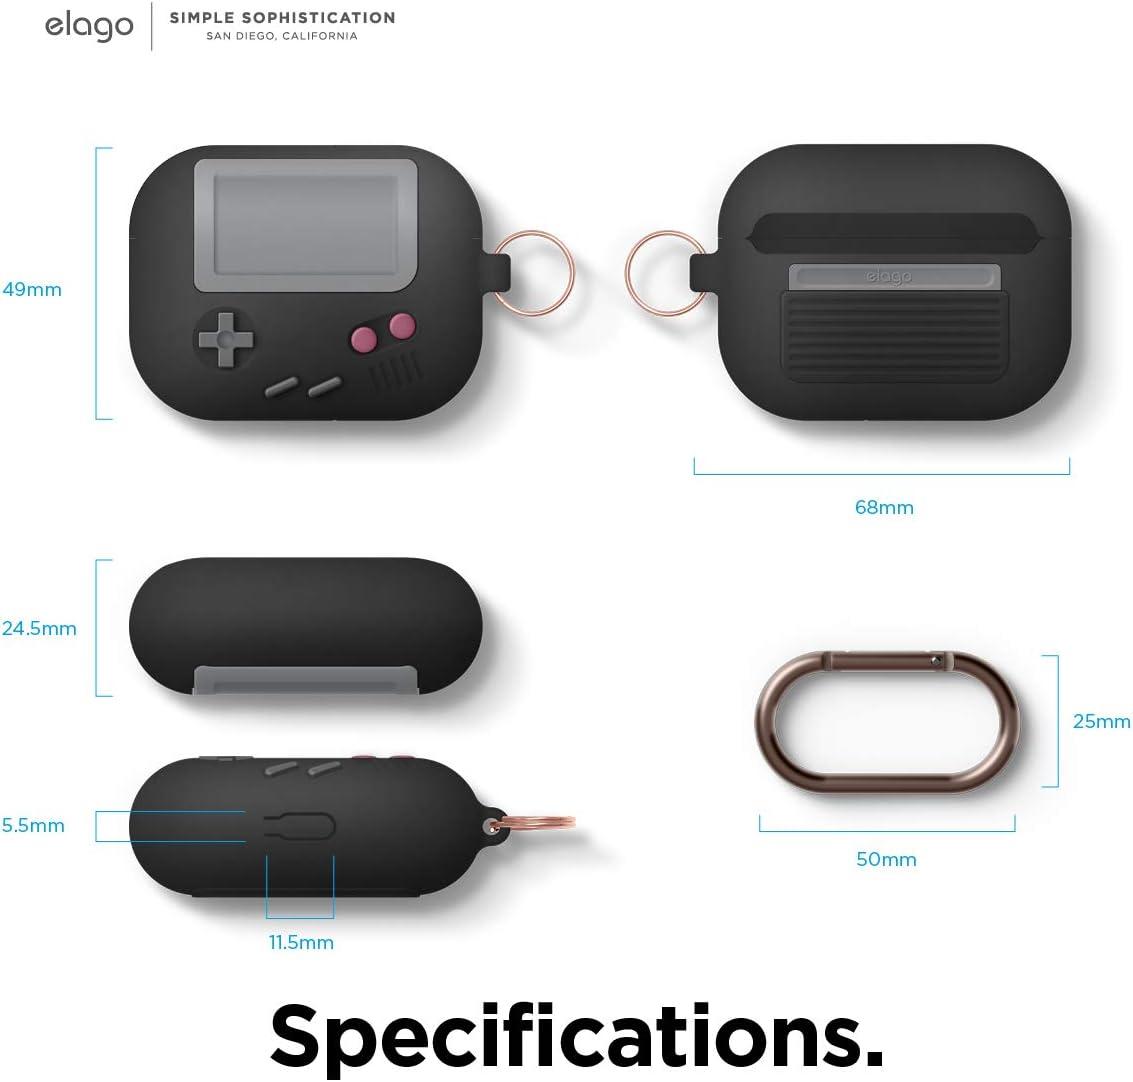 Gris Claro elago Funda AW5 Dise/ño Cl/ásico Game Player Dise/ñado para AirPods Pro Funda Pendiente Patente US